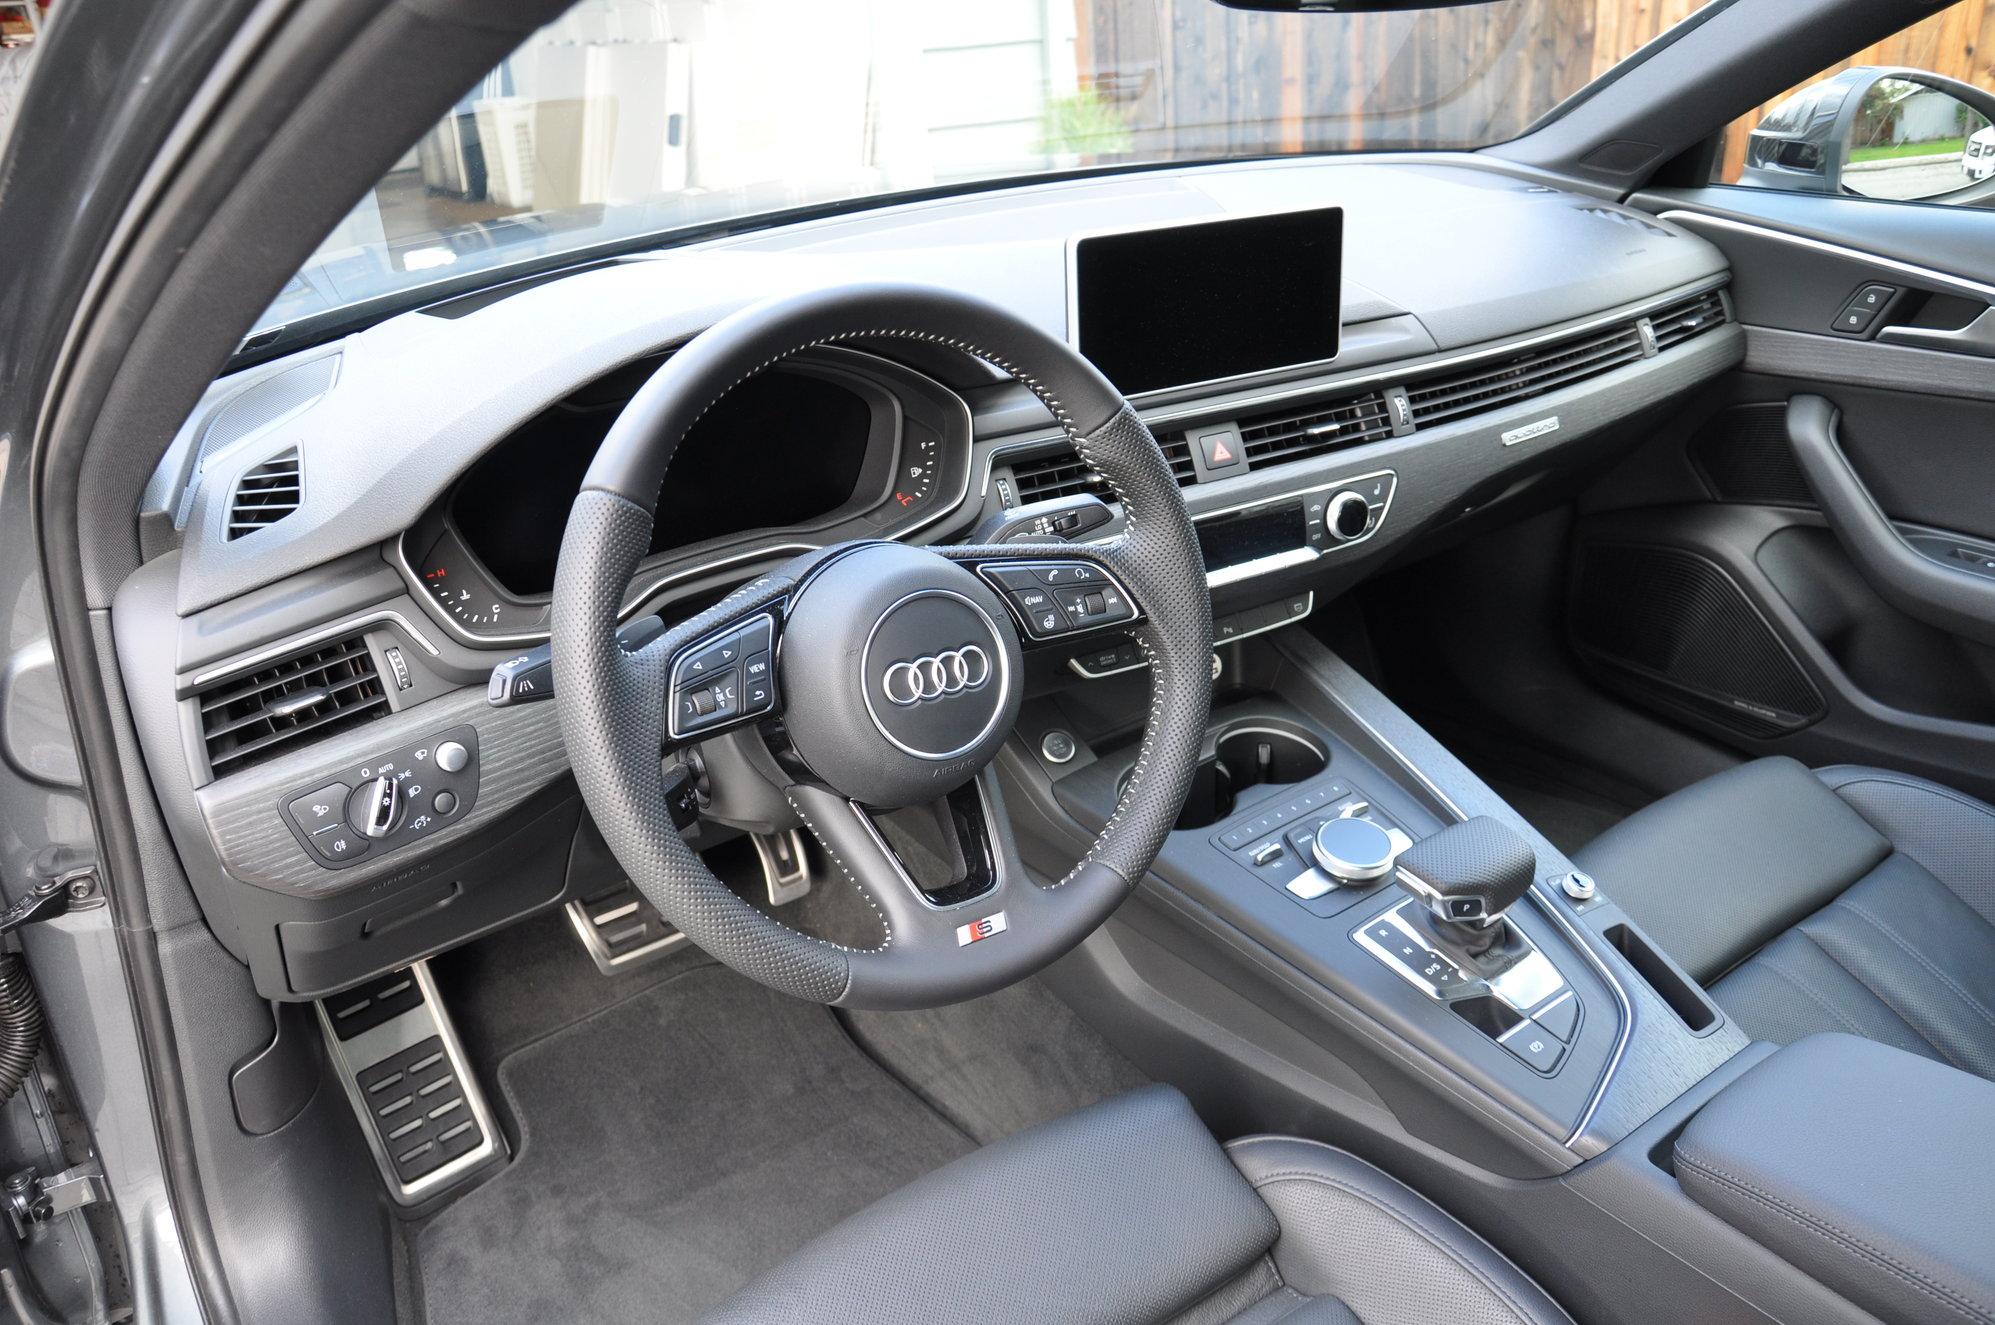 Certified Pre Owned Audi Q5 >> Audi A4 2017 Audi A4 Prestige (S-Line trim) - AudiWorld Forums